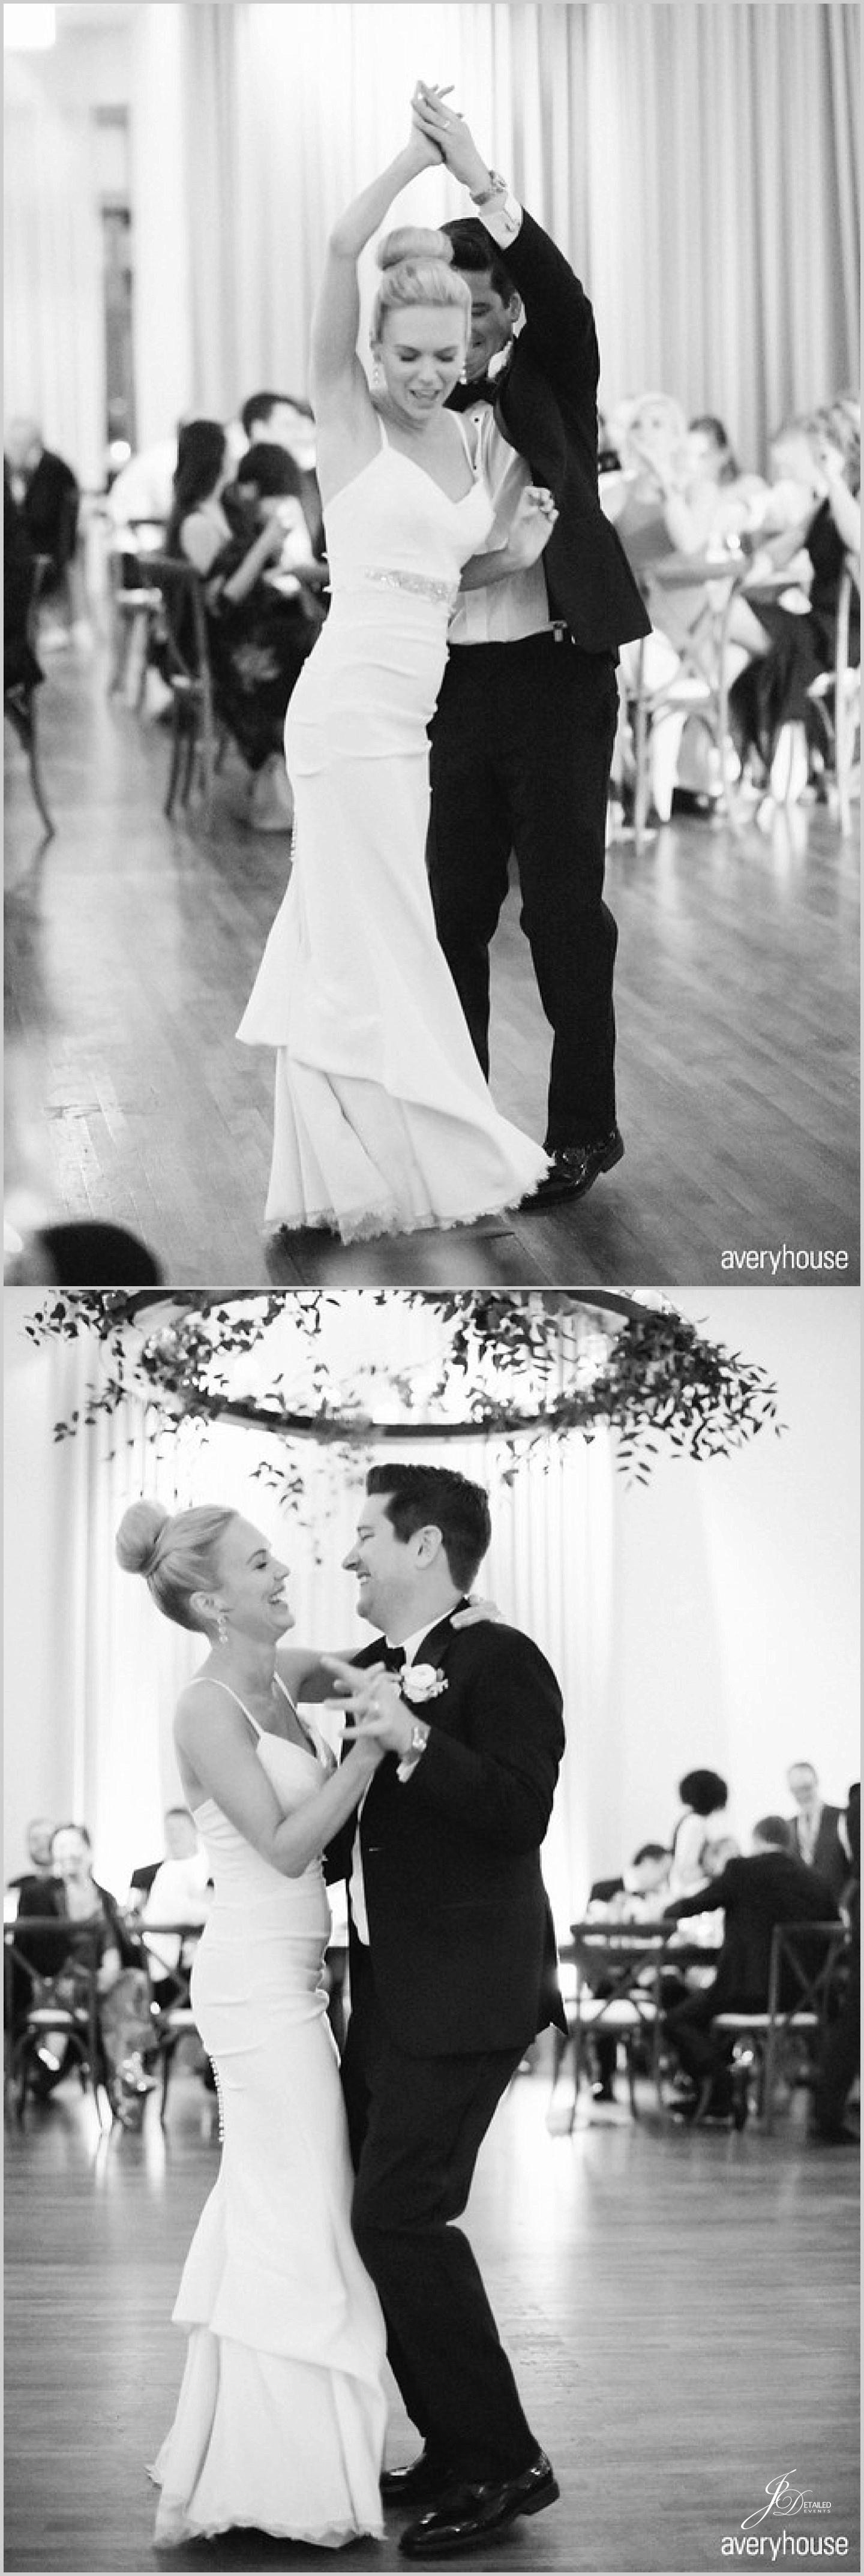 avery-house-wedding-chicago_2227